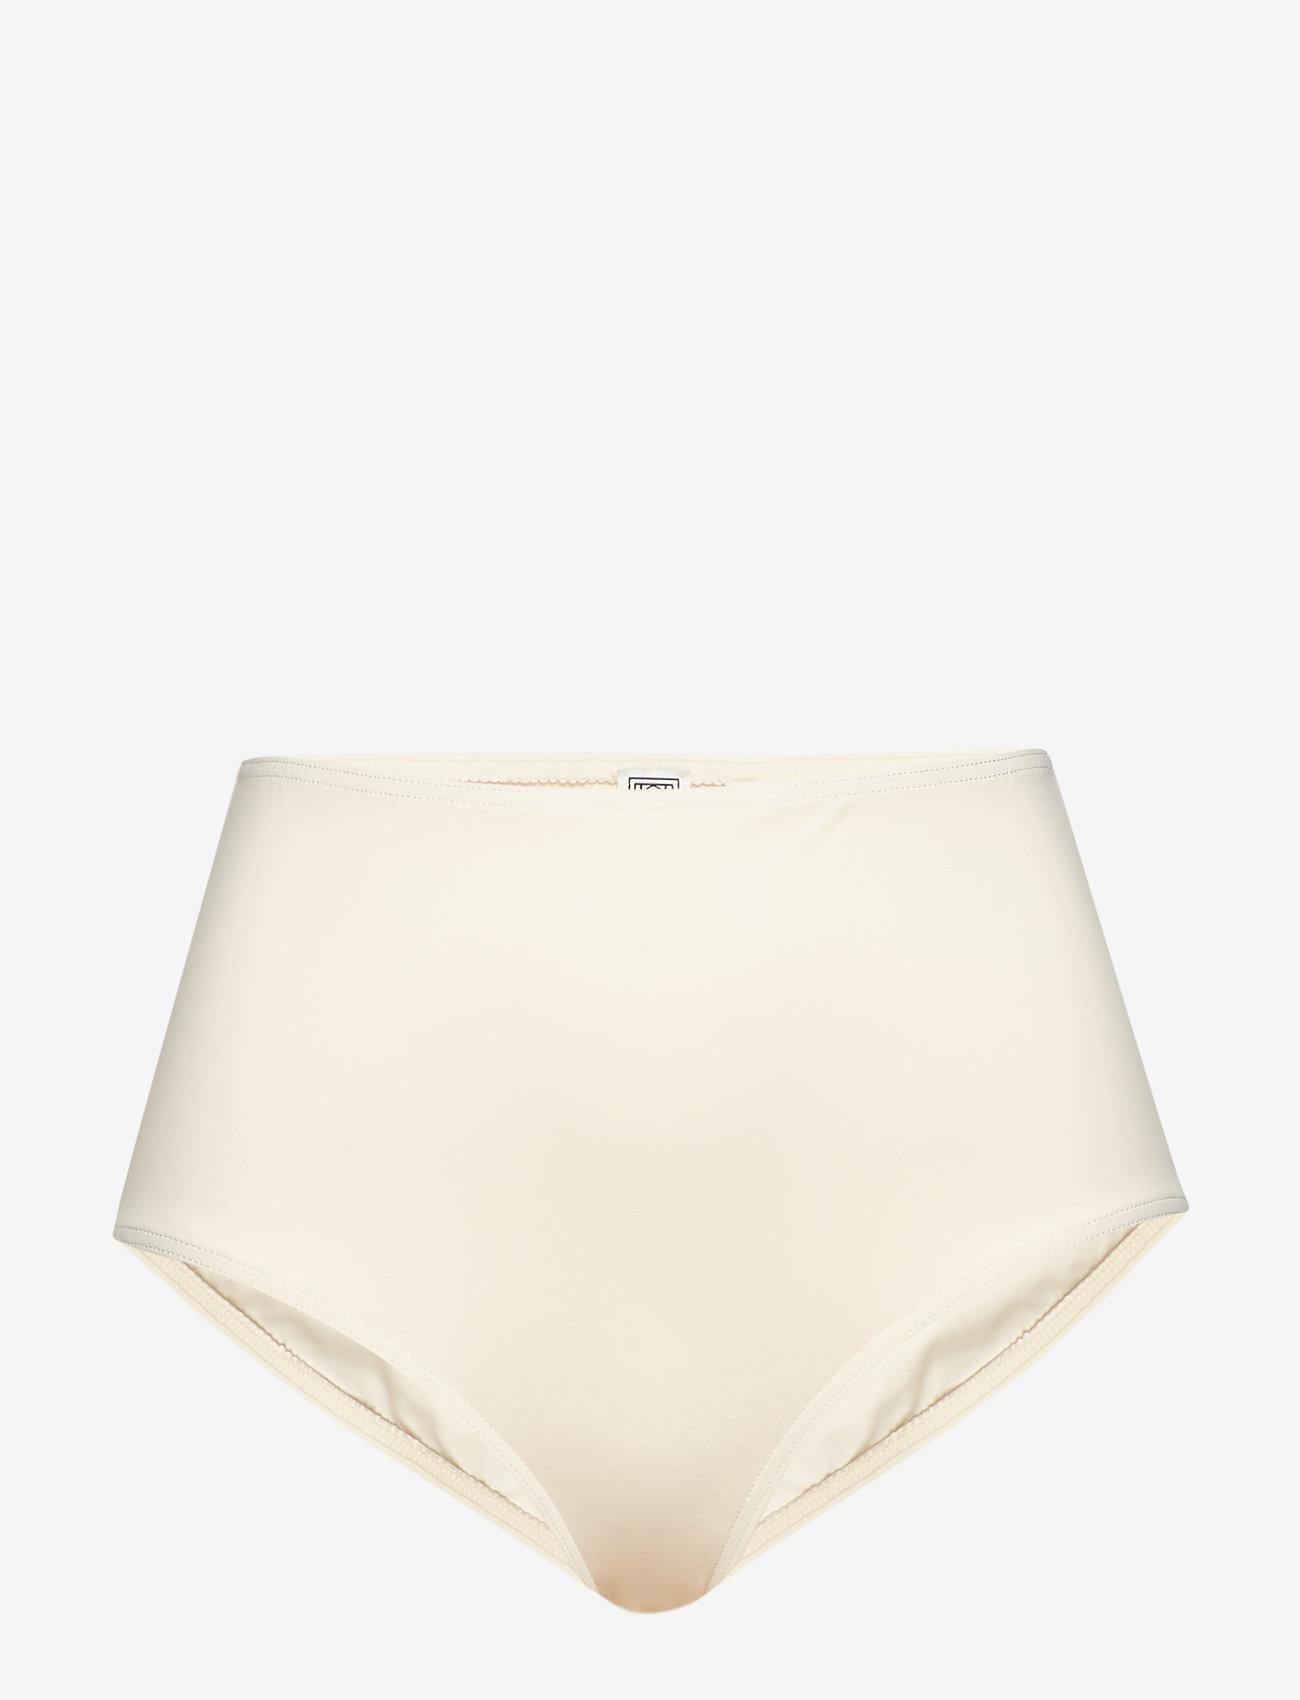 Totême - PETRONA - bikini underdele - creme 820 - 0